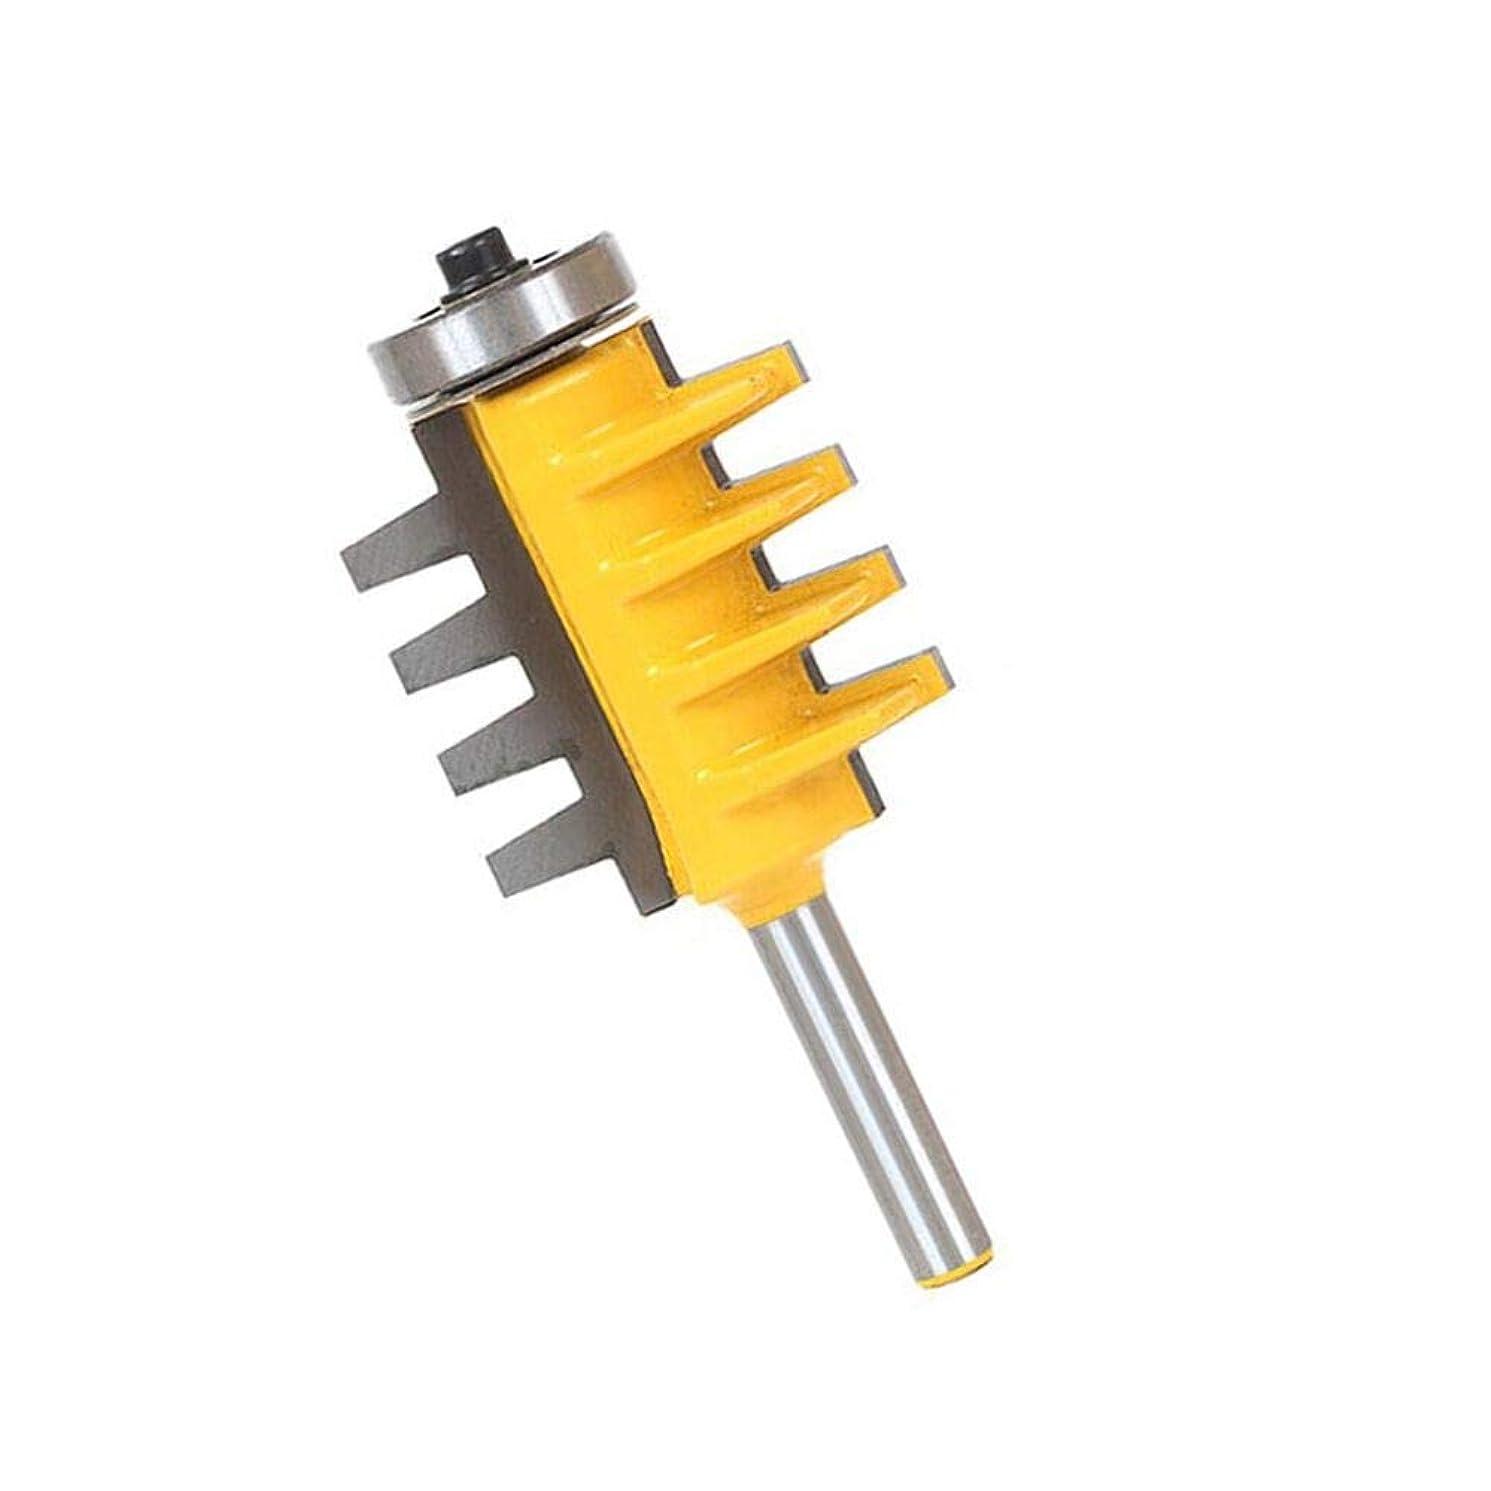 Finger Joint Router Bit,Yingte 1/2 Inch Shank Reversible Finger Joint Glue Joint Router Bit for Woodworking